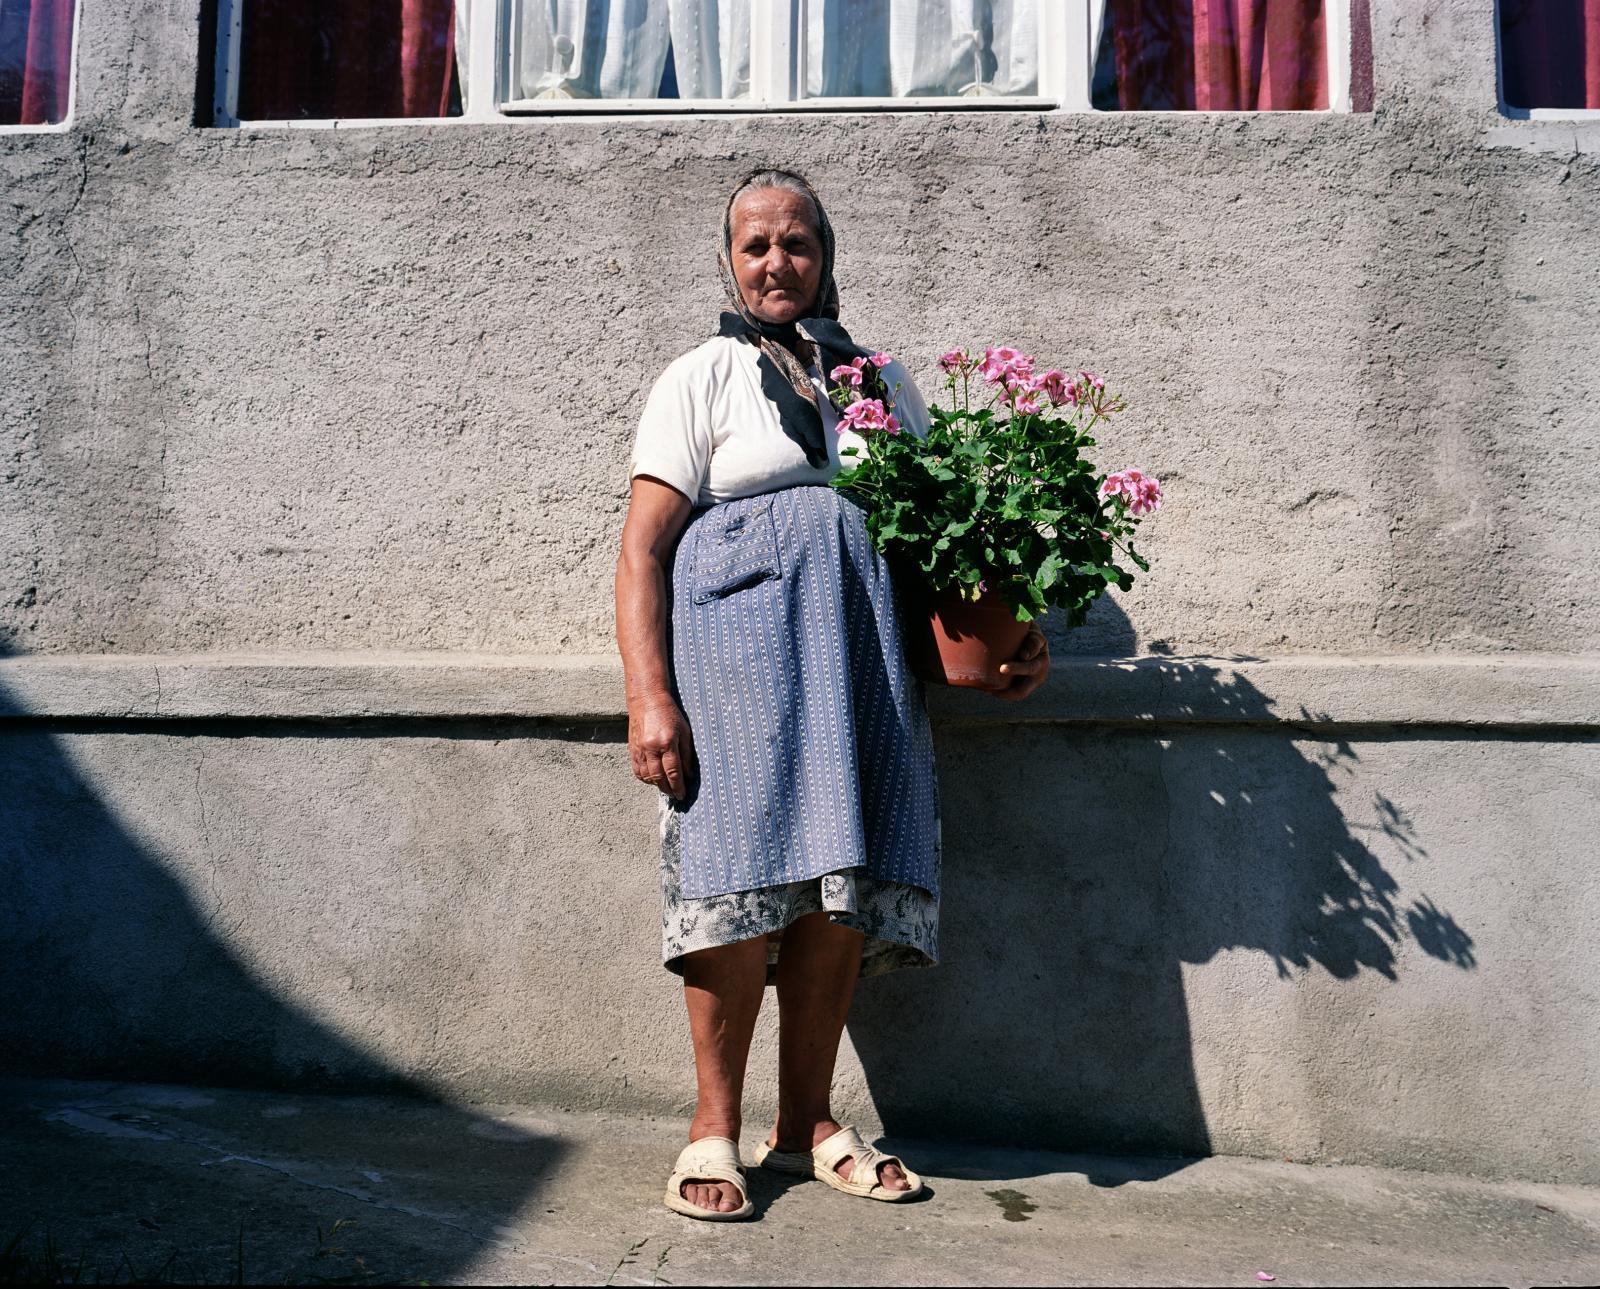 Photography image - Loading Romania-2012-6x7-1-of-1-2_3240.jpg